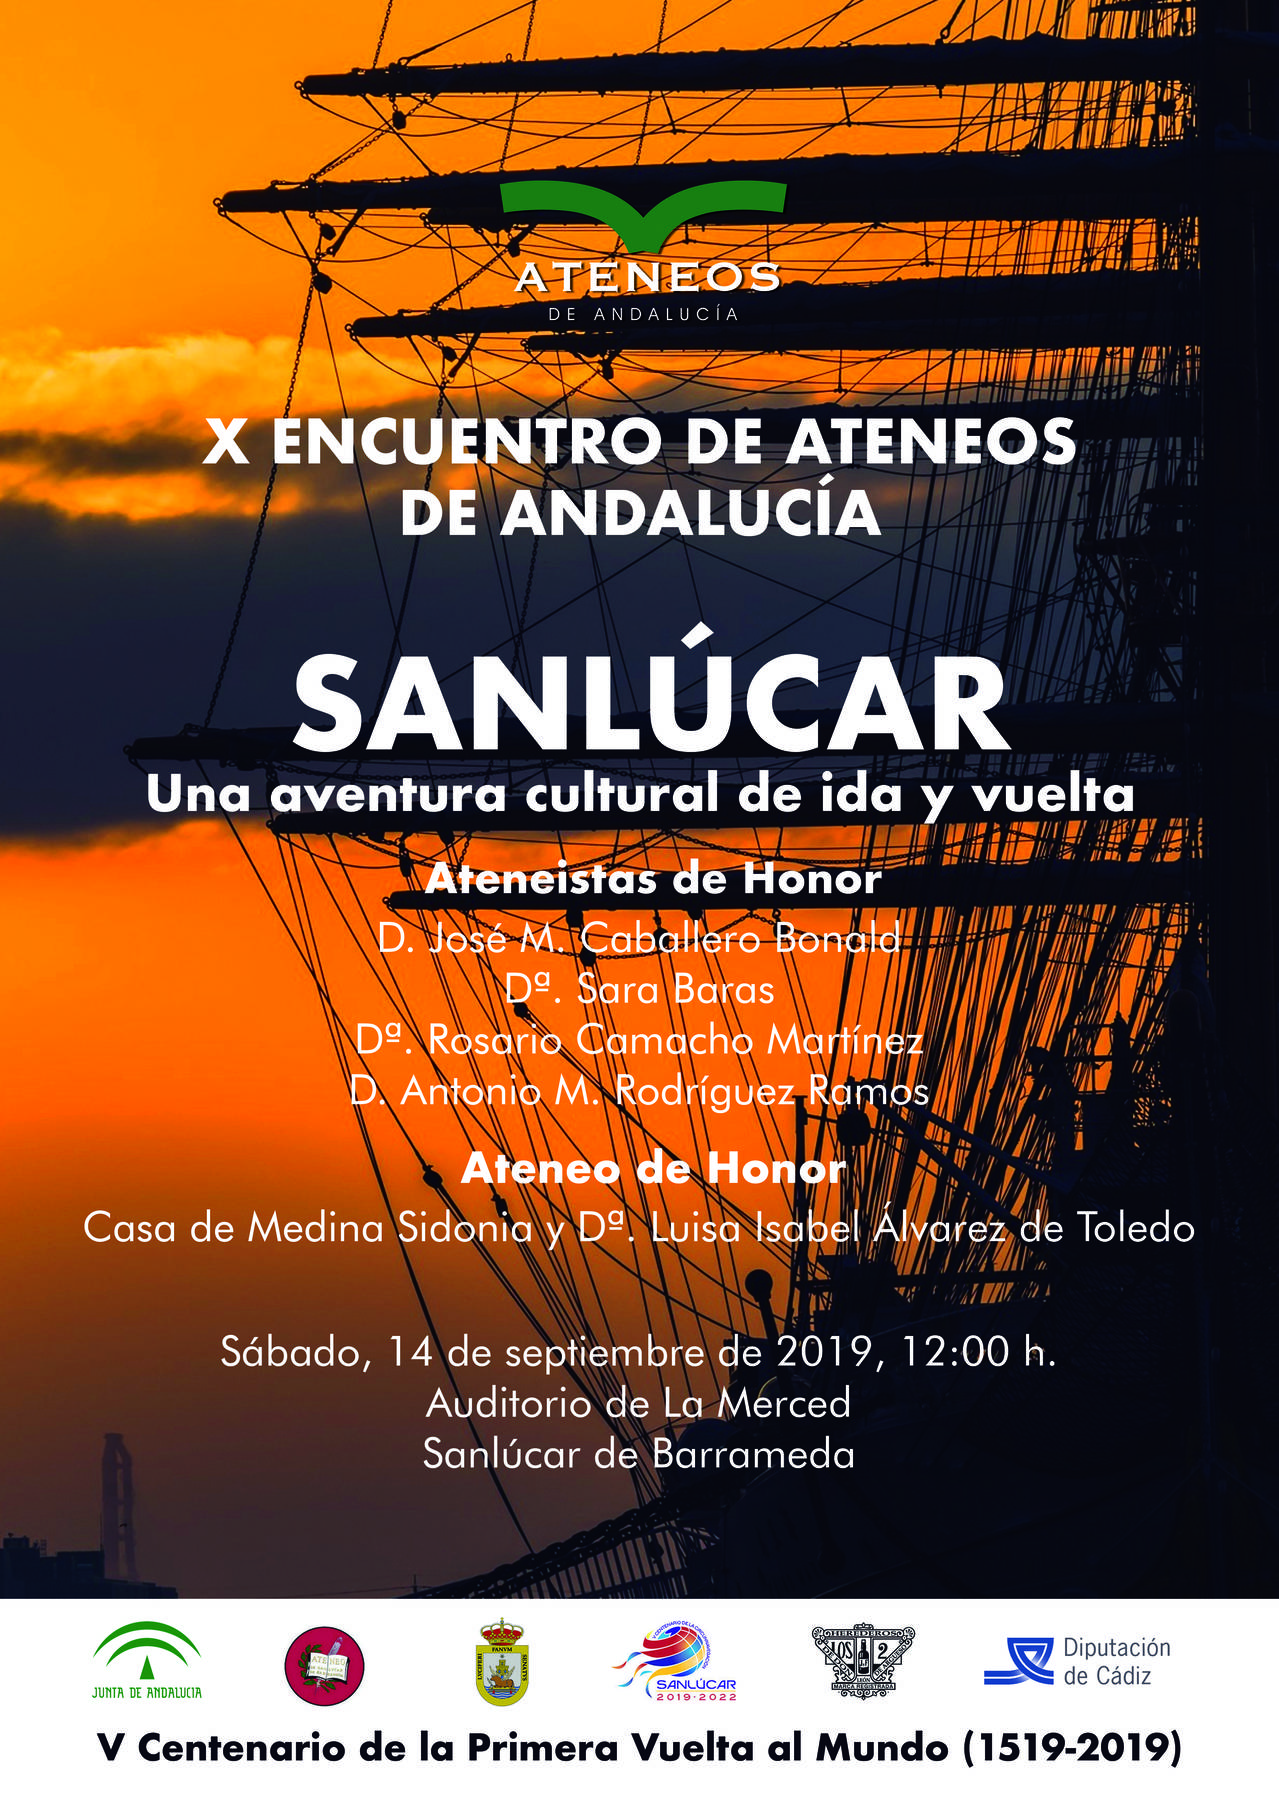 X Encounter Athenaeums of Andalusia in Sanlúcar de Barrameda, Cádiz